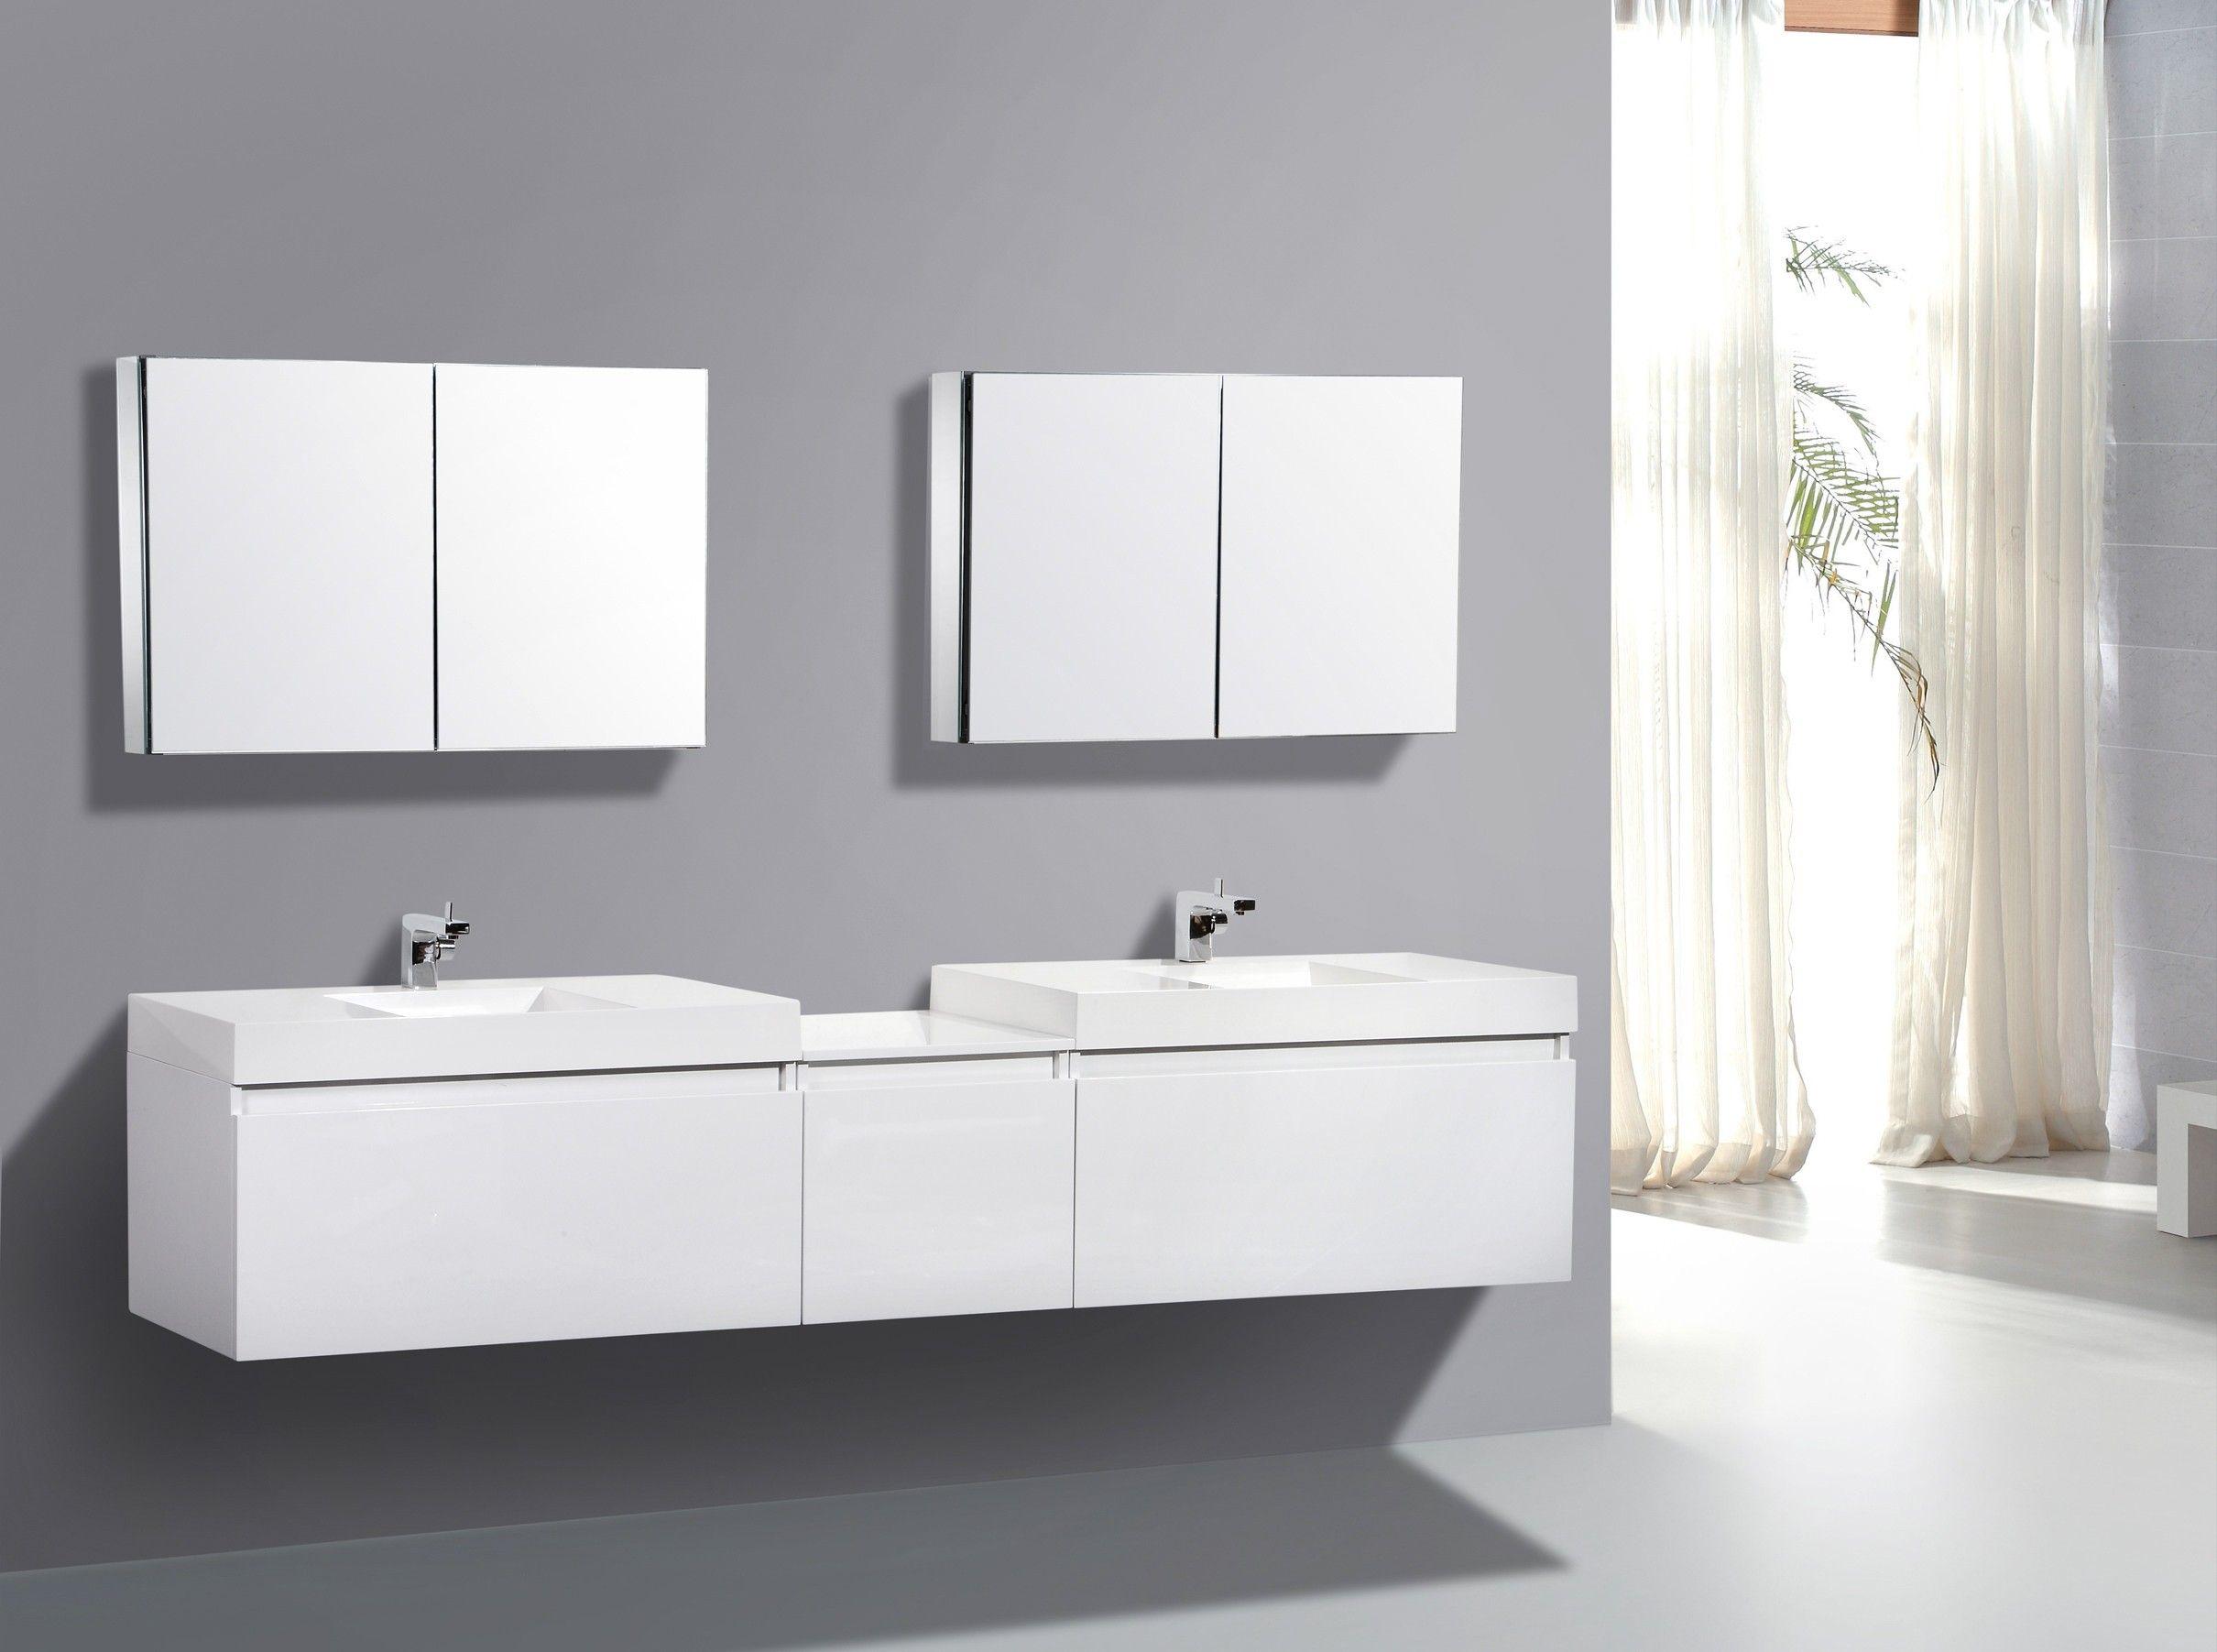 Contemporary double bathroom vanities - Black Modern Bathroom Photo Bathroom Design Pinterest Modern Bathroom